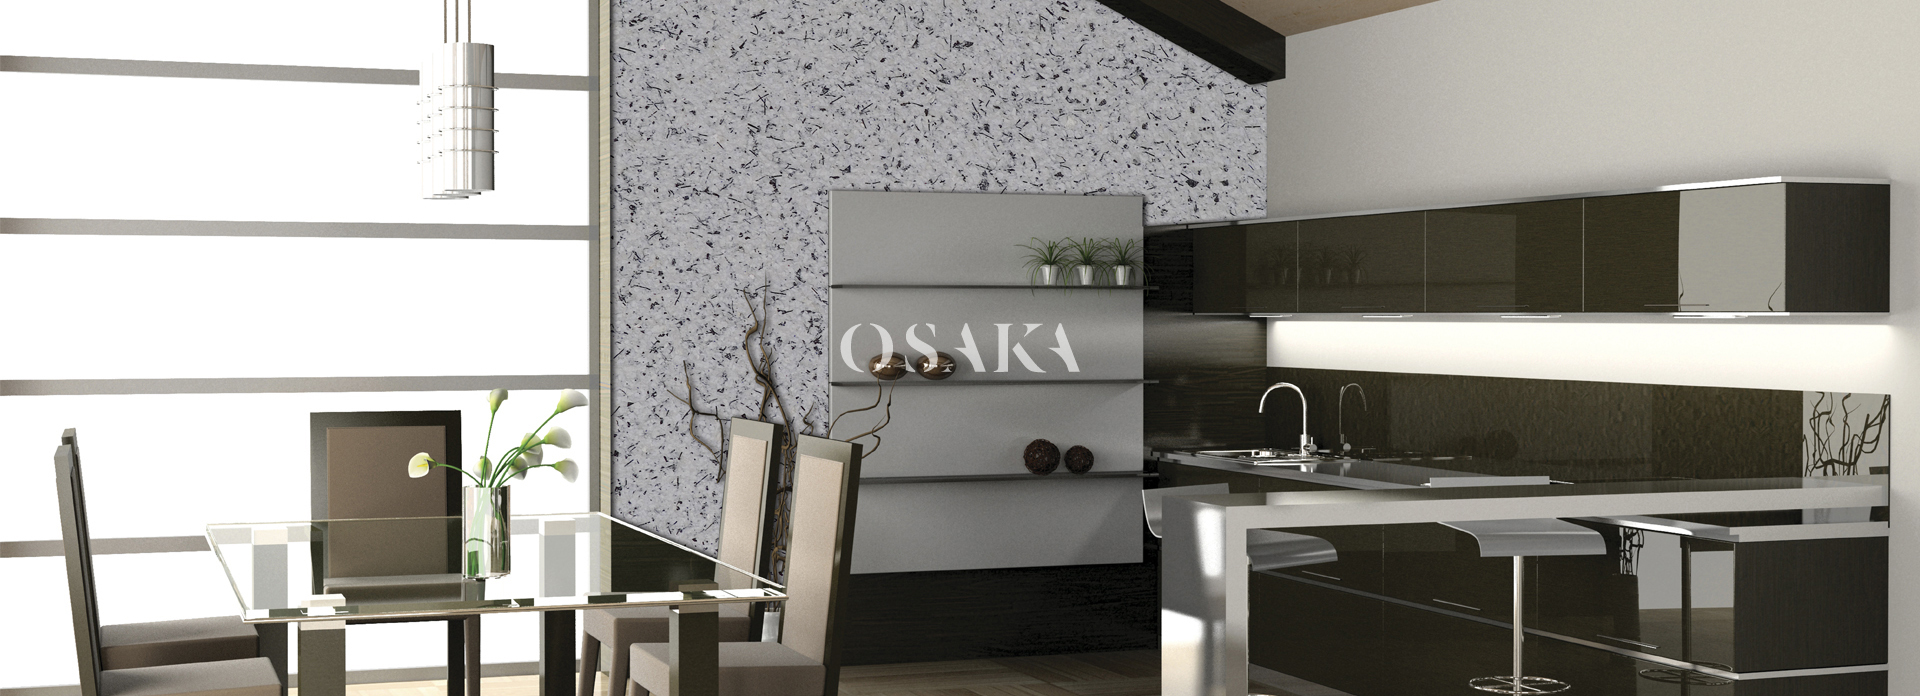 pintura-decorativaosaka-textil-japonés-3